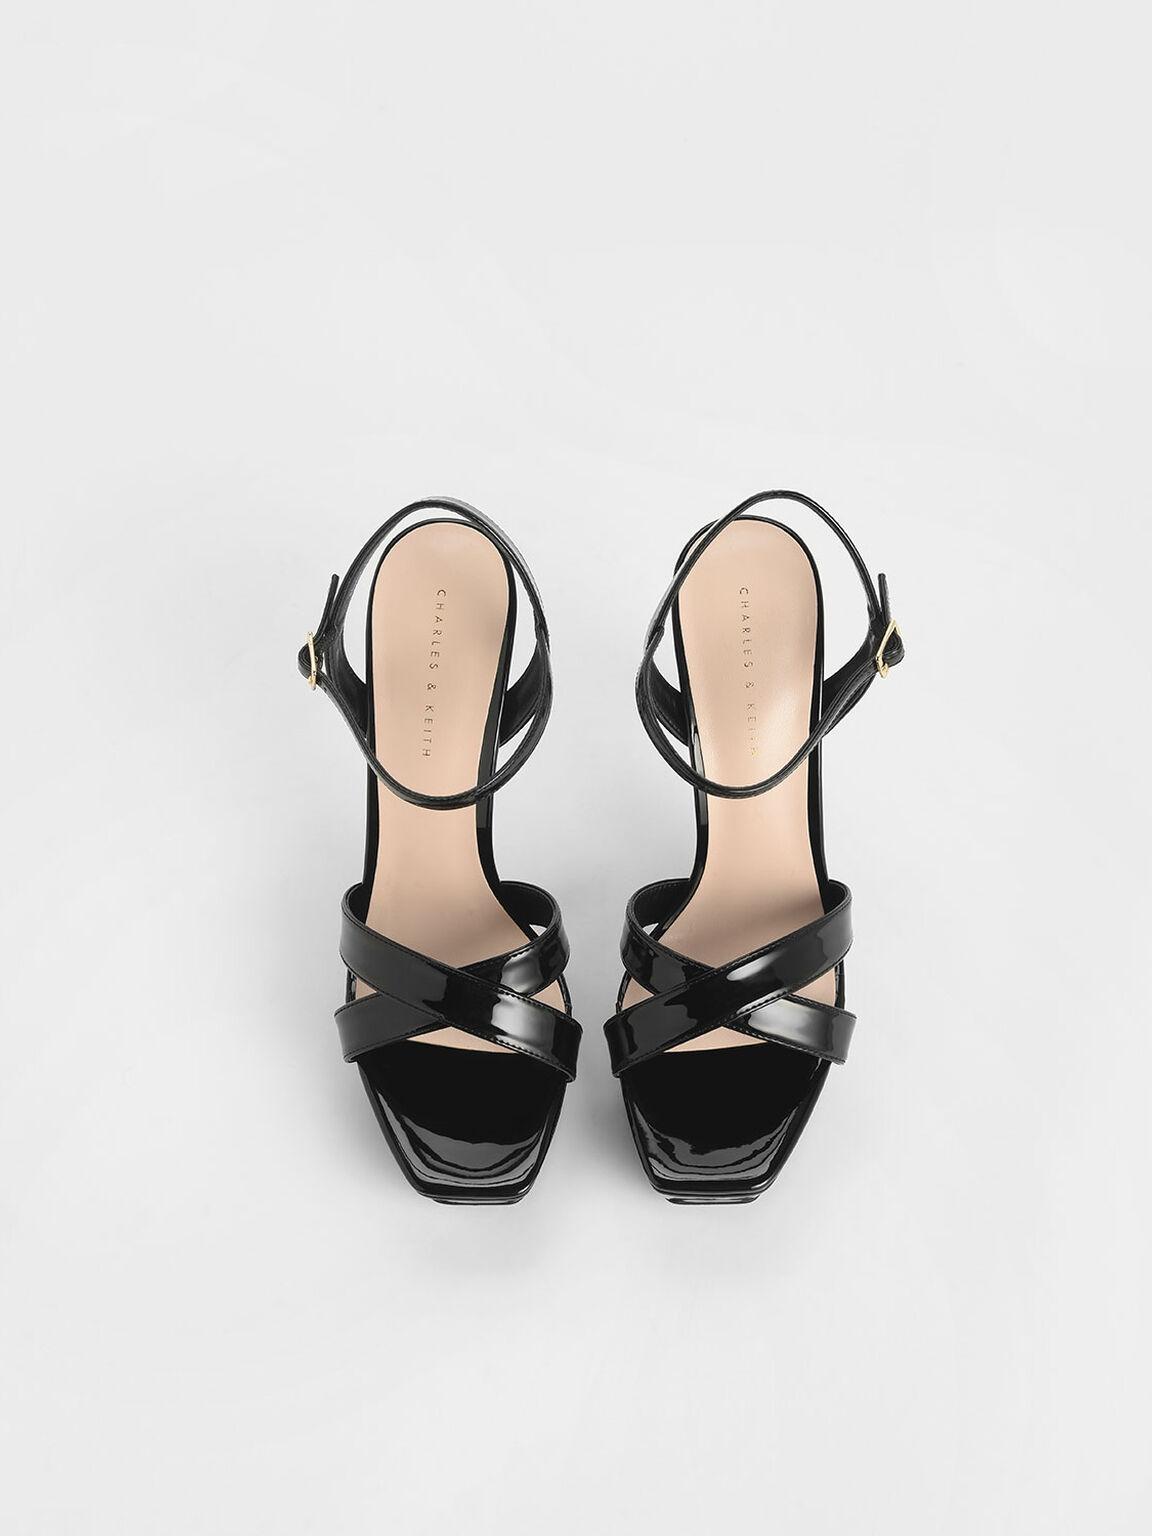 Criss Cross Ankle Strap Patent Platform Heels, Black, hi-res